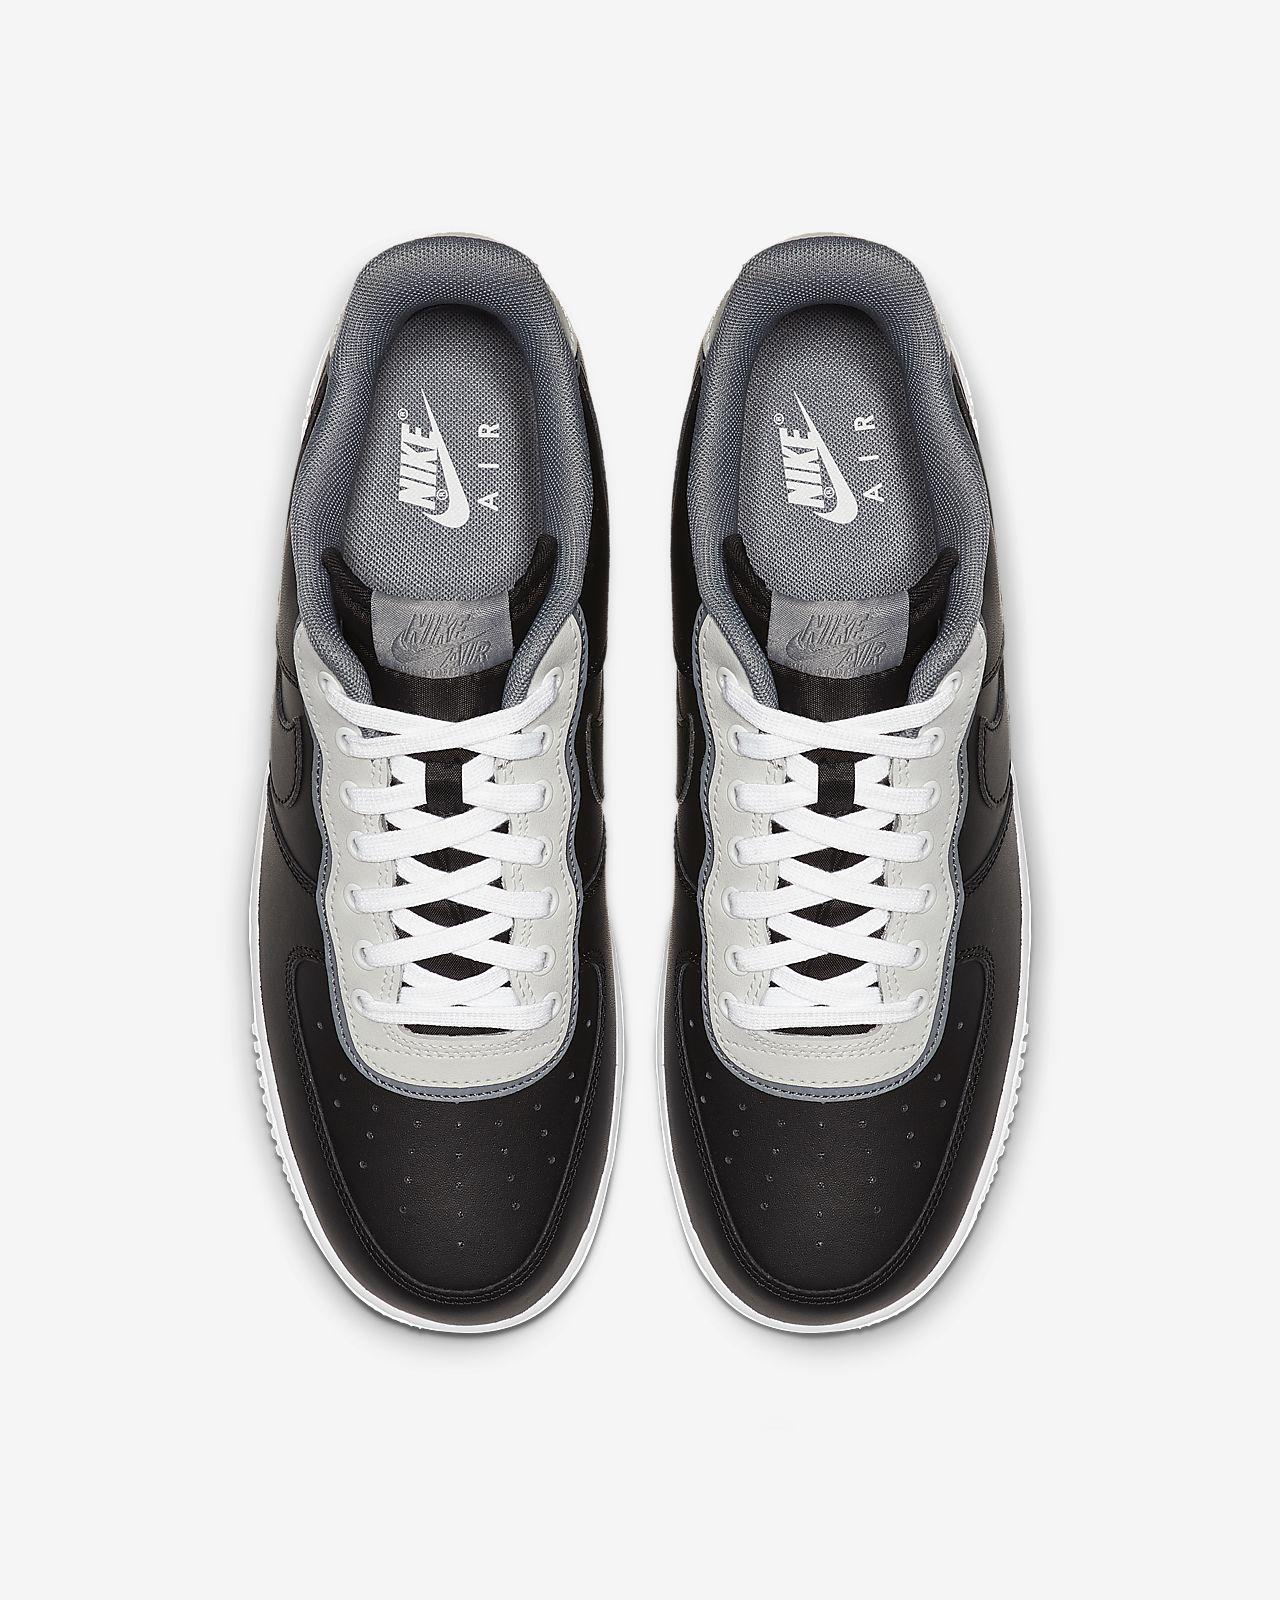 1 '07 Homme Pour Chaussure Force Nike Lv8 Air lT1JFKc